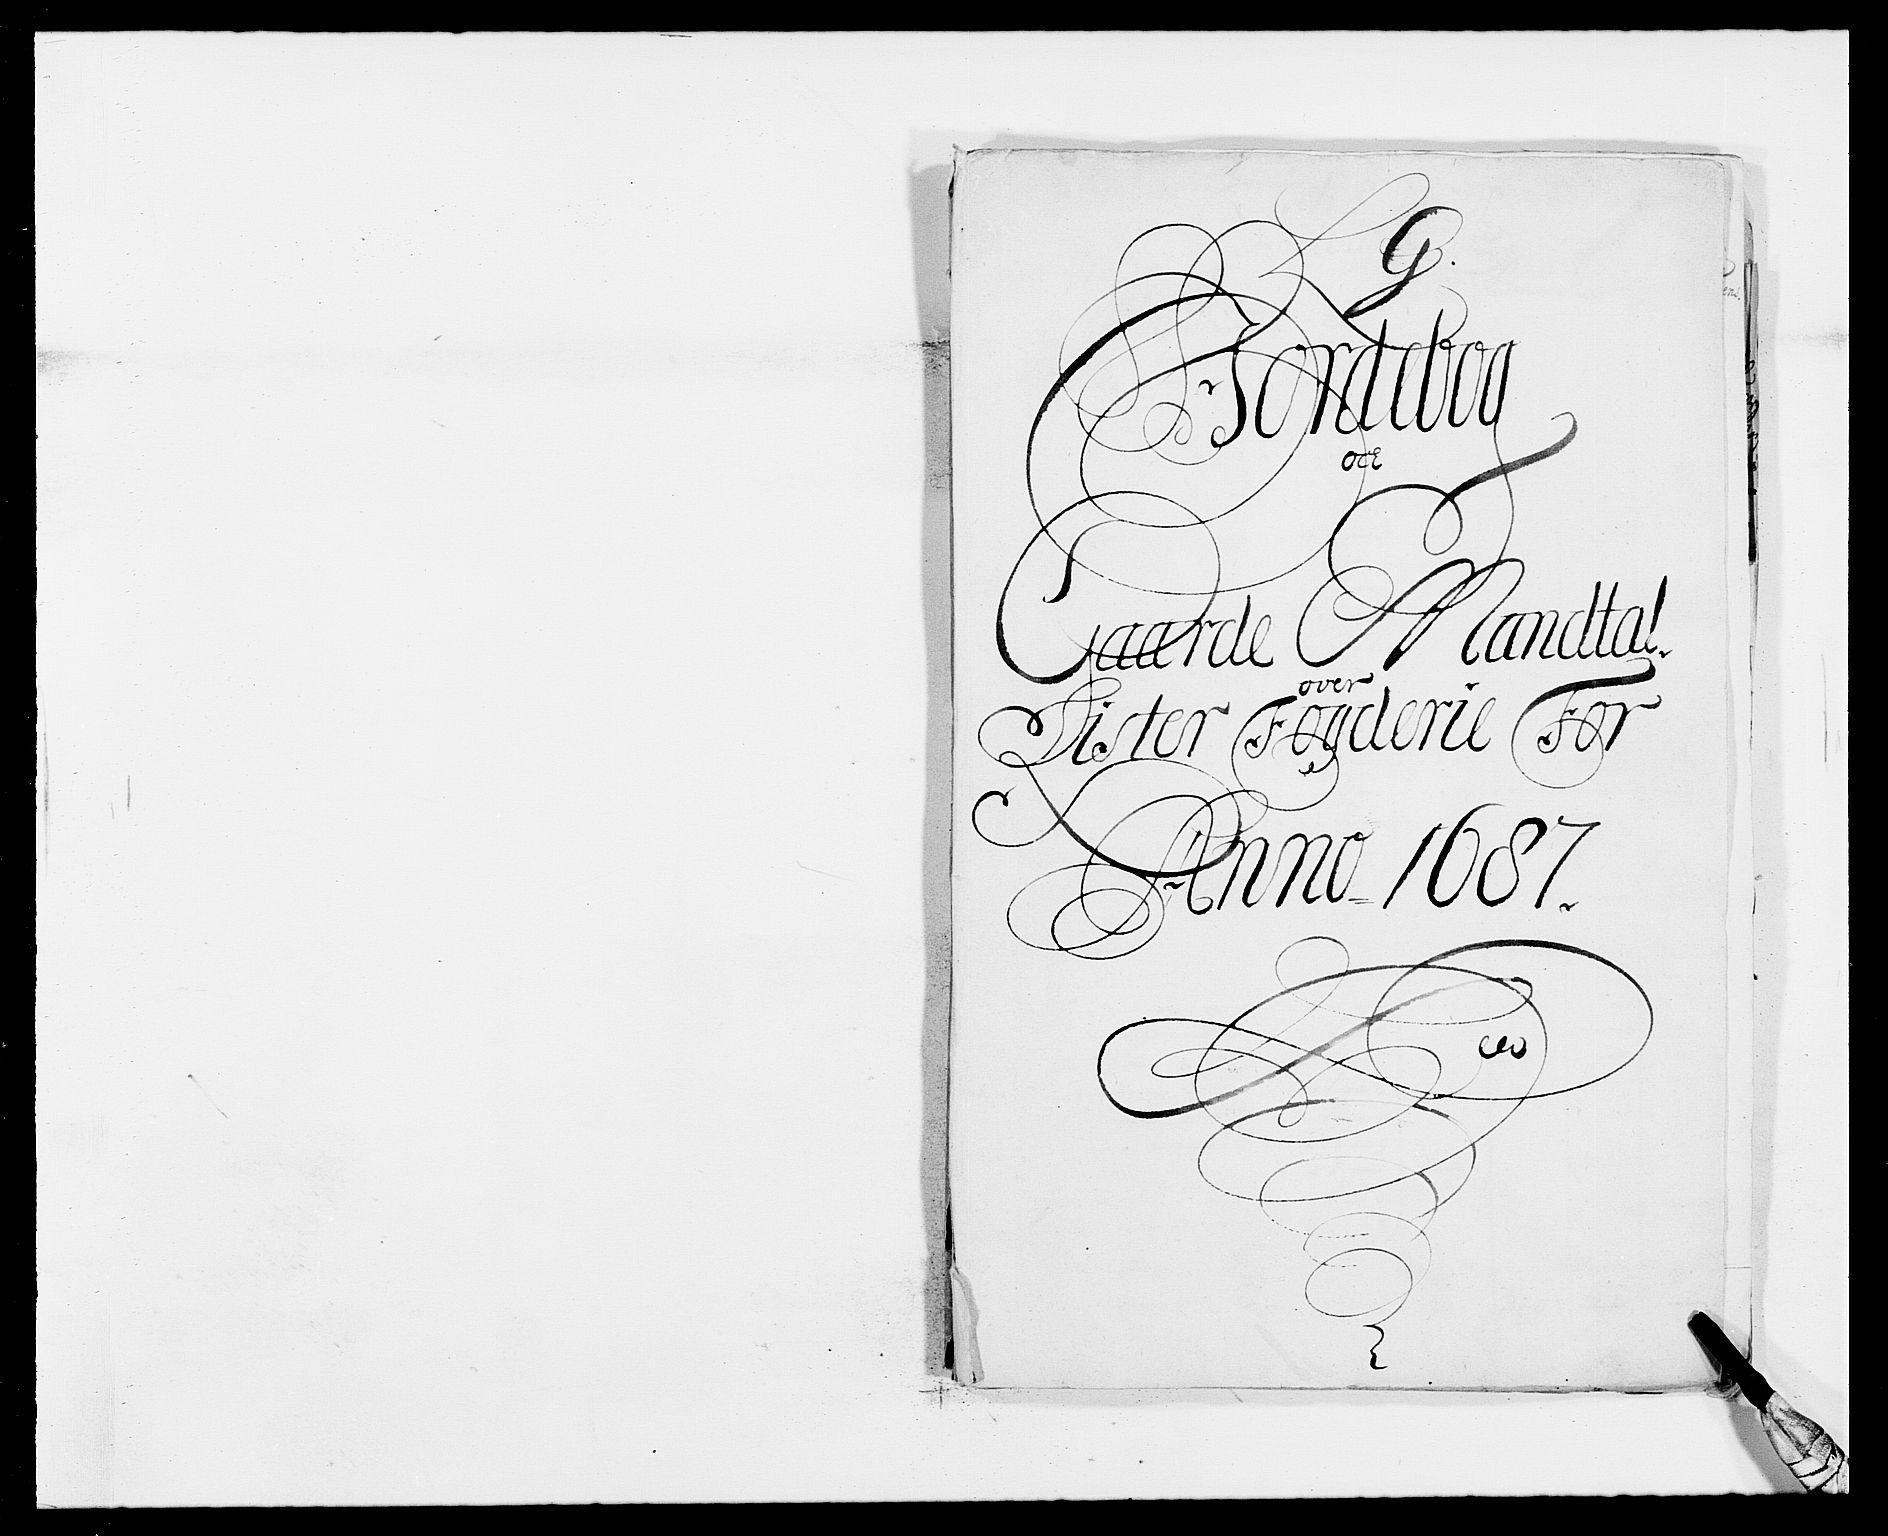 RA, Rentekammeret inntil 1814, Reviderte regnskaper, Fogderegnskap, R41/L2534: Fogderegnskap Lista, 1686-1688, s. 103